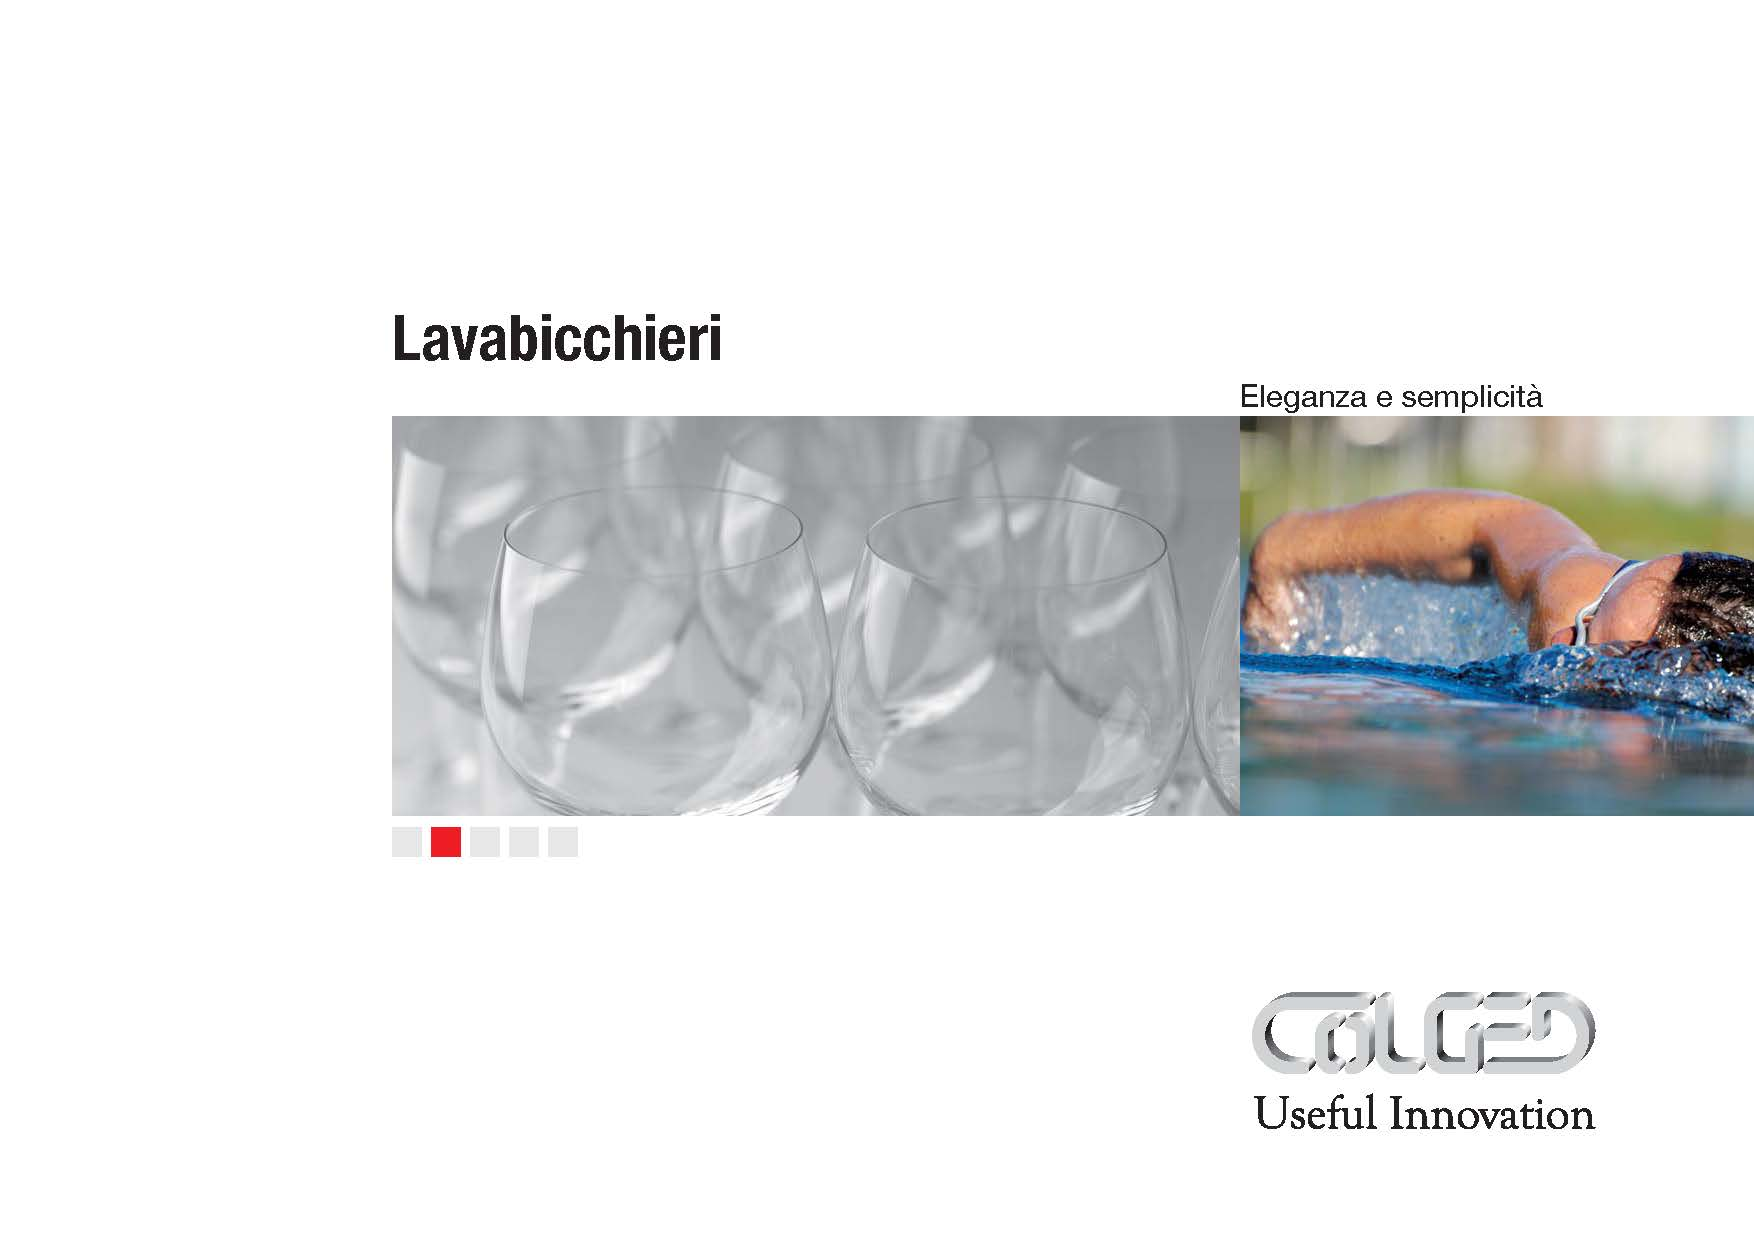 Colged – Catalogo Lavabicchieri